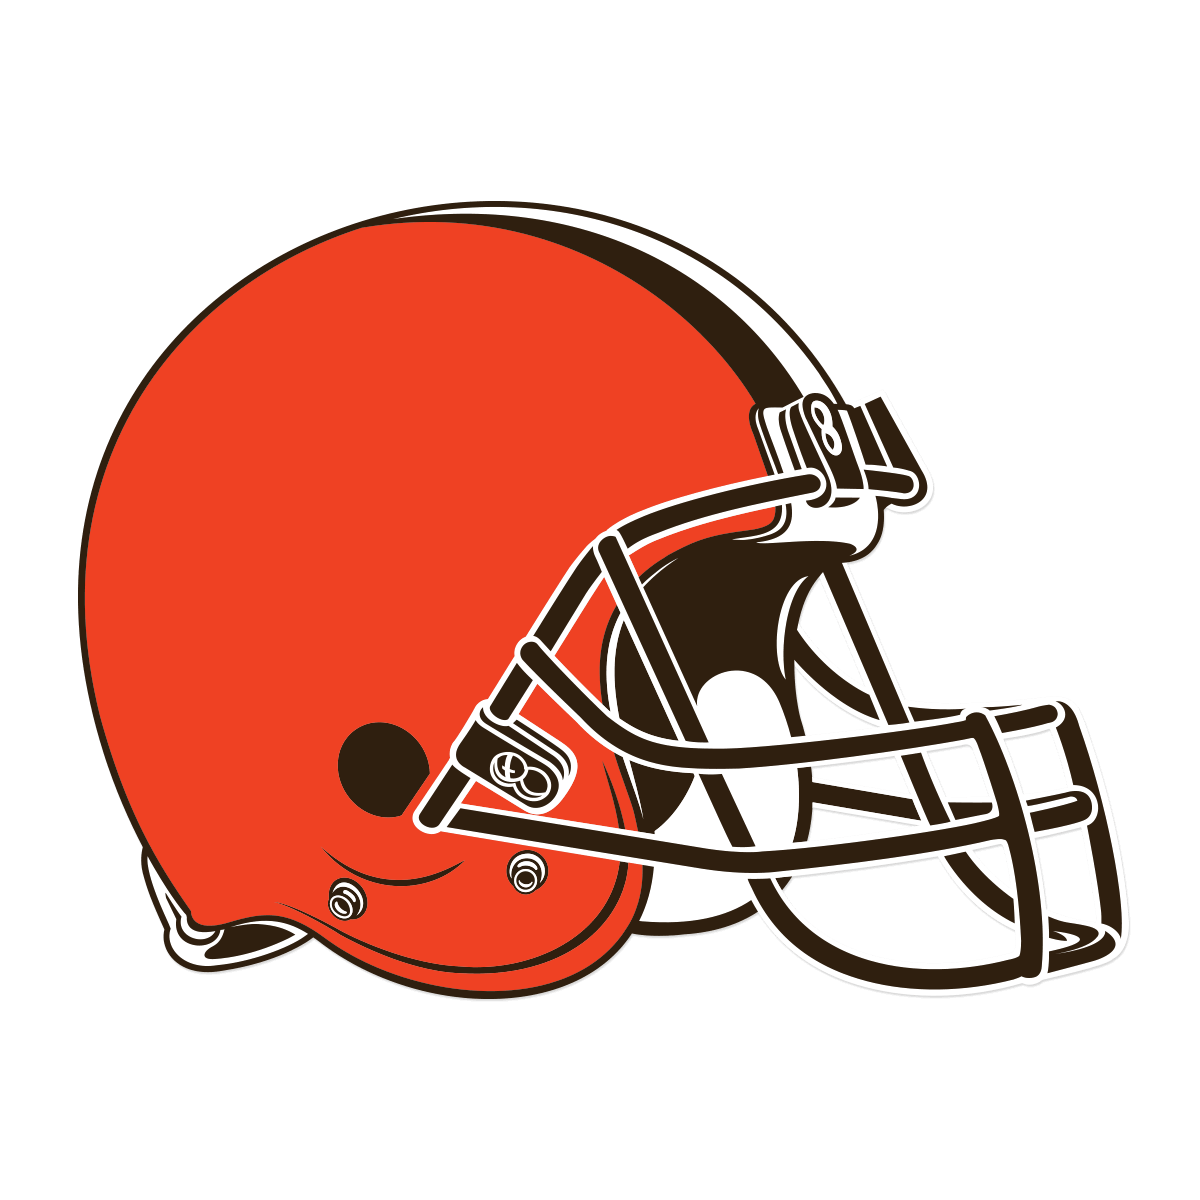 Cleveland Browns på TV stream - Tid da386f6abb101